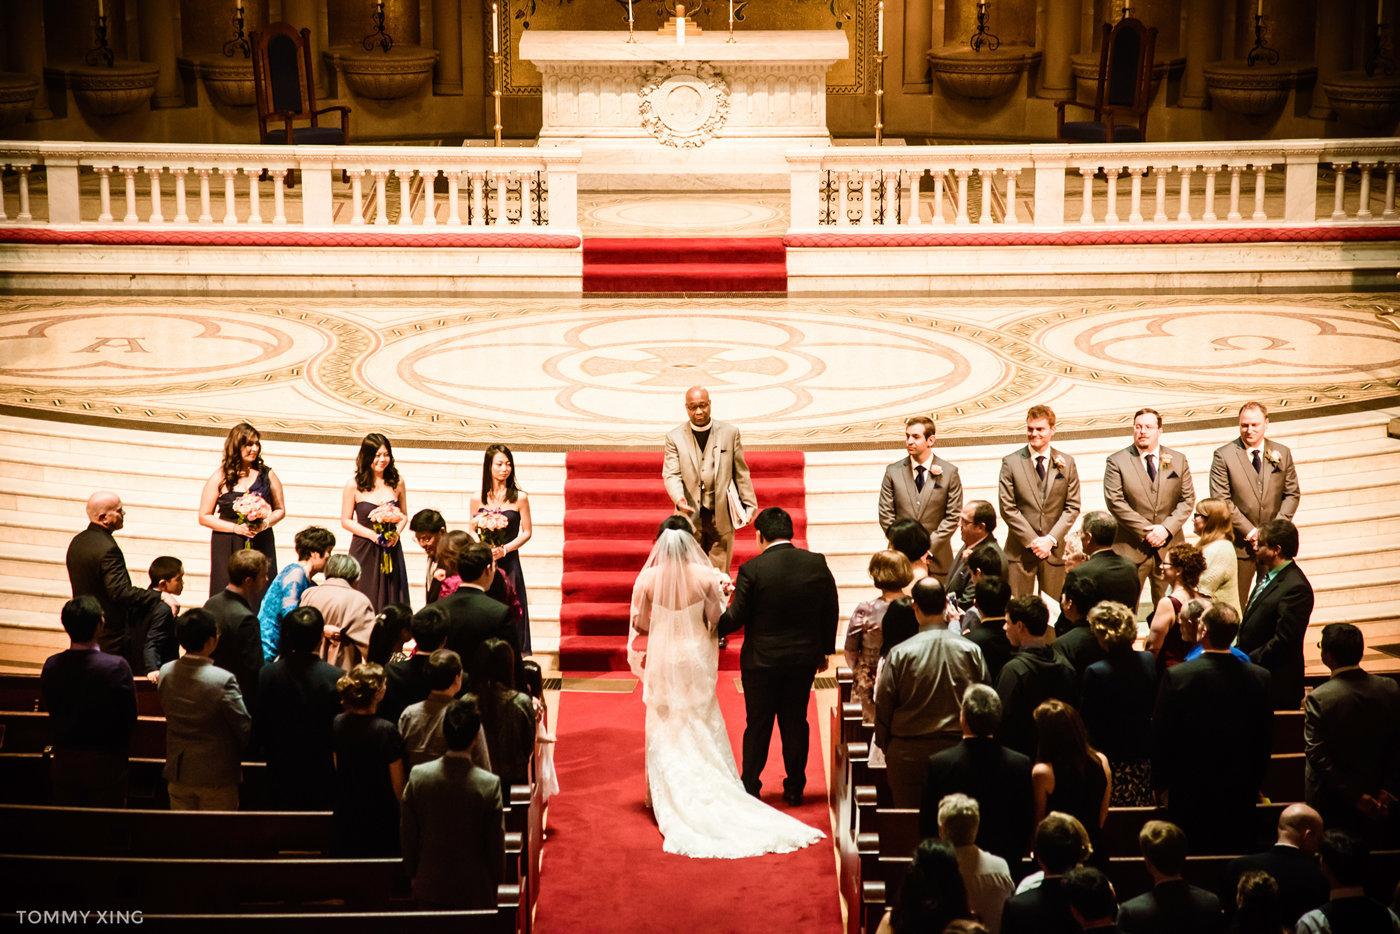 STANFORD MEMORIAL CHURCH WEDDING - Wenjie & Chengcheng - SAN FRANCISCO BAY AREA 斯坦福教堂婚礼跟拍 - 洛杉矶婚礼婚纱照摄影师 Tommy Xing Photography085.jpg